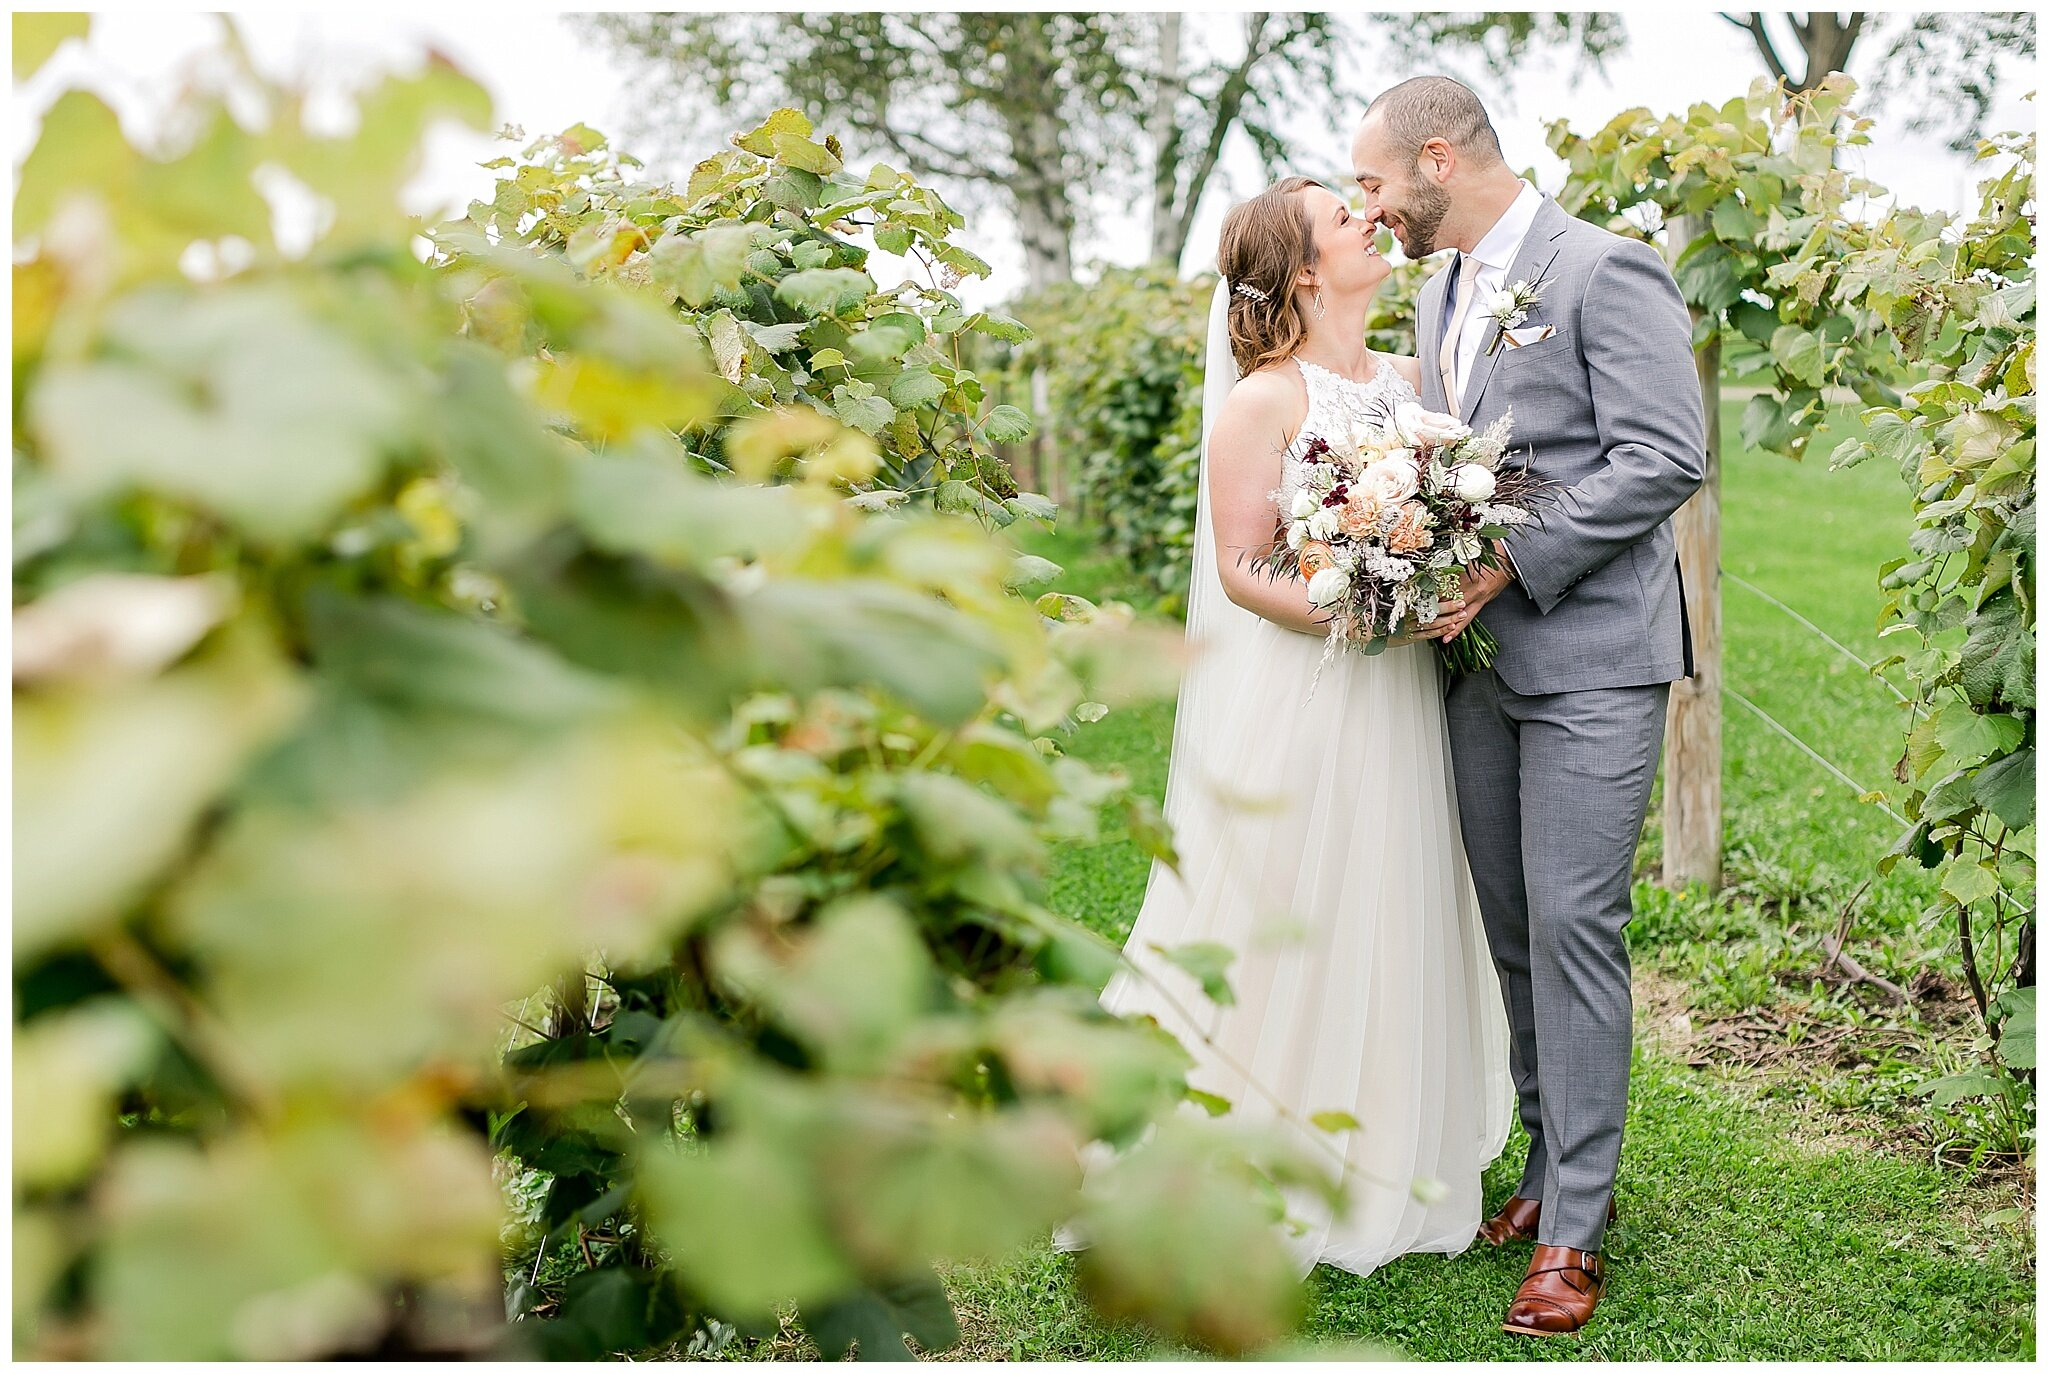 over_the_vines_edgerton_wisconsin_wedding_madison_wisconsin_photographer_0431.jpg